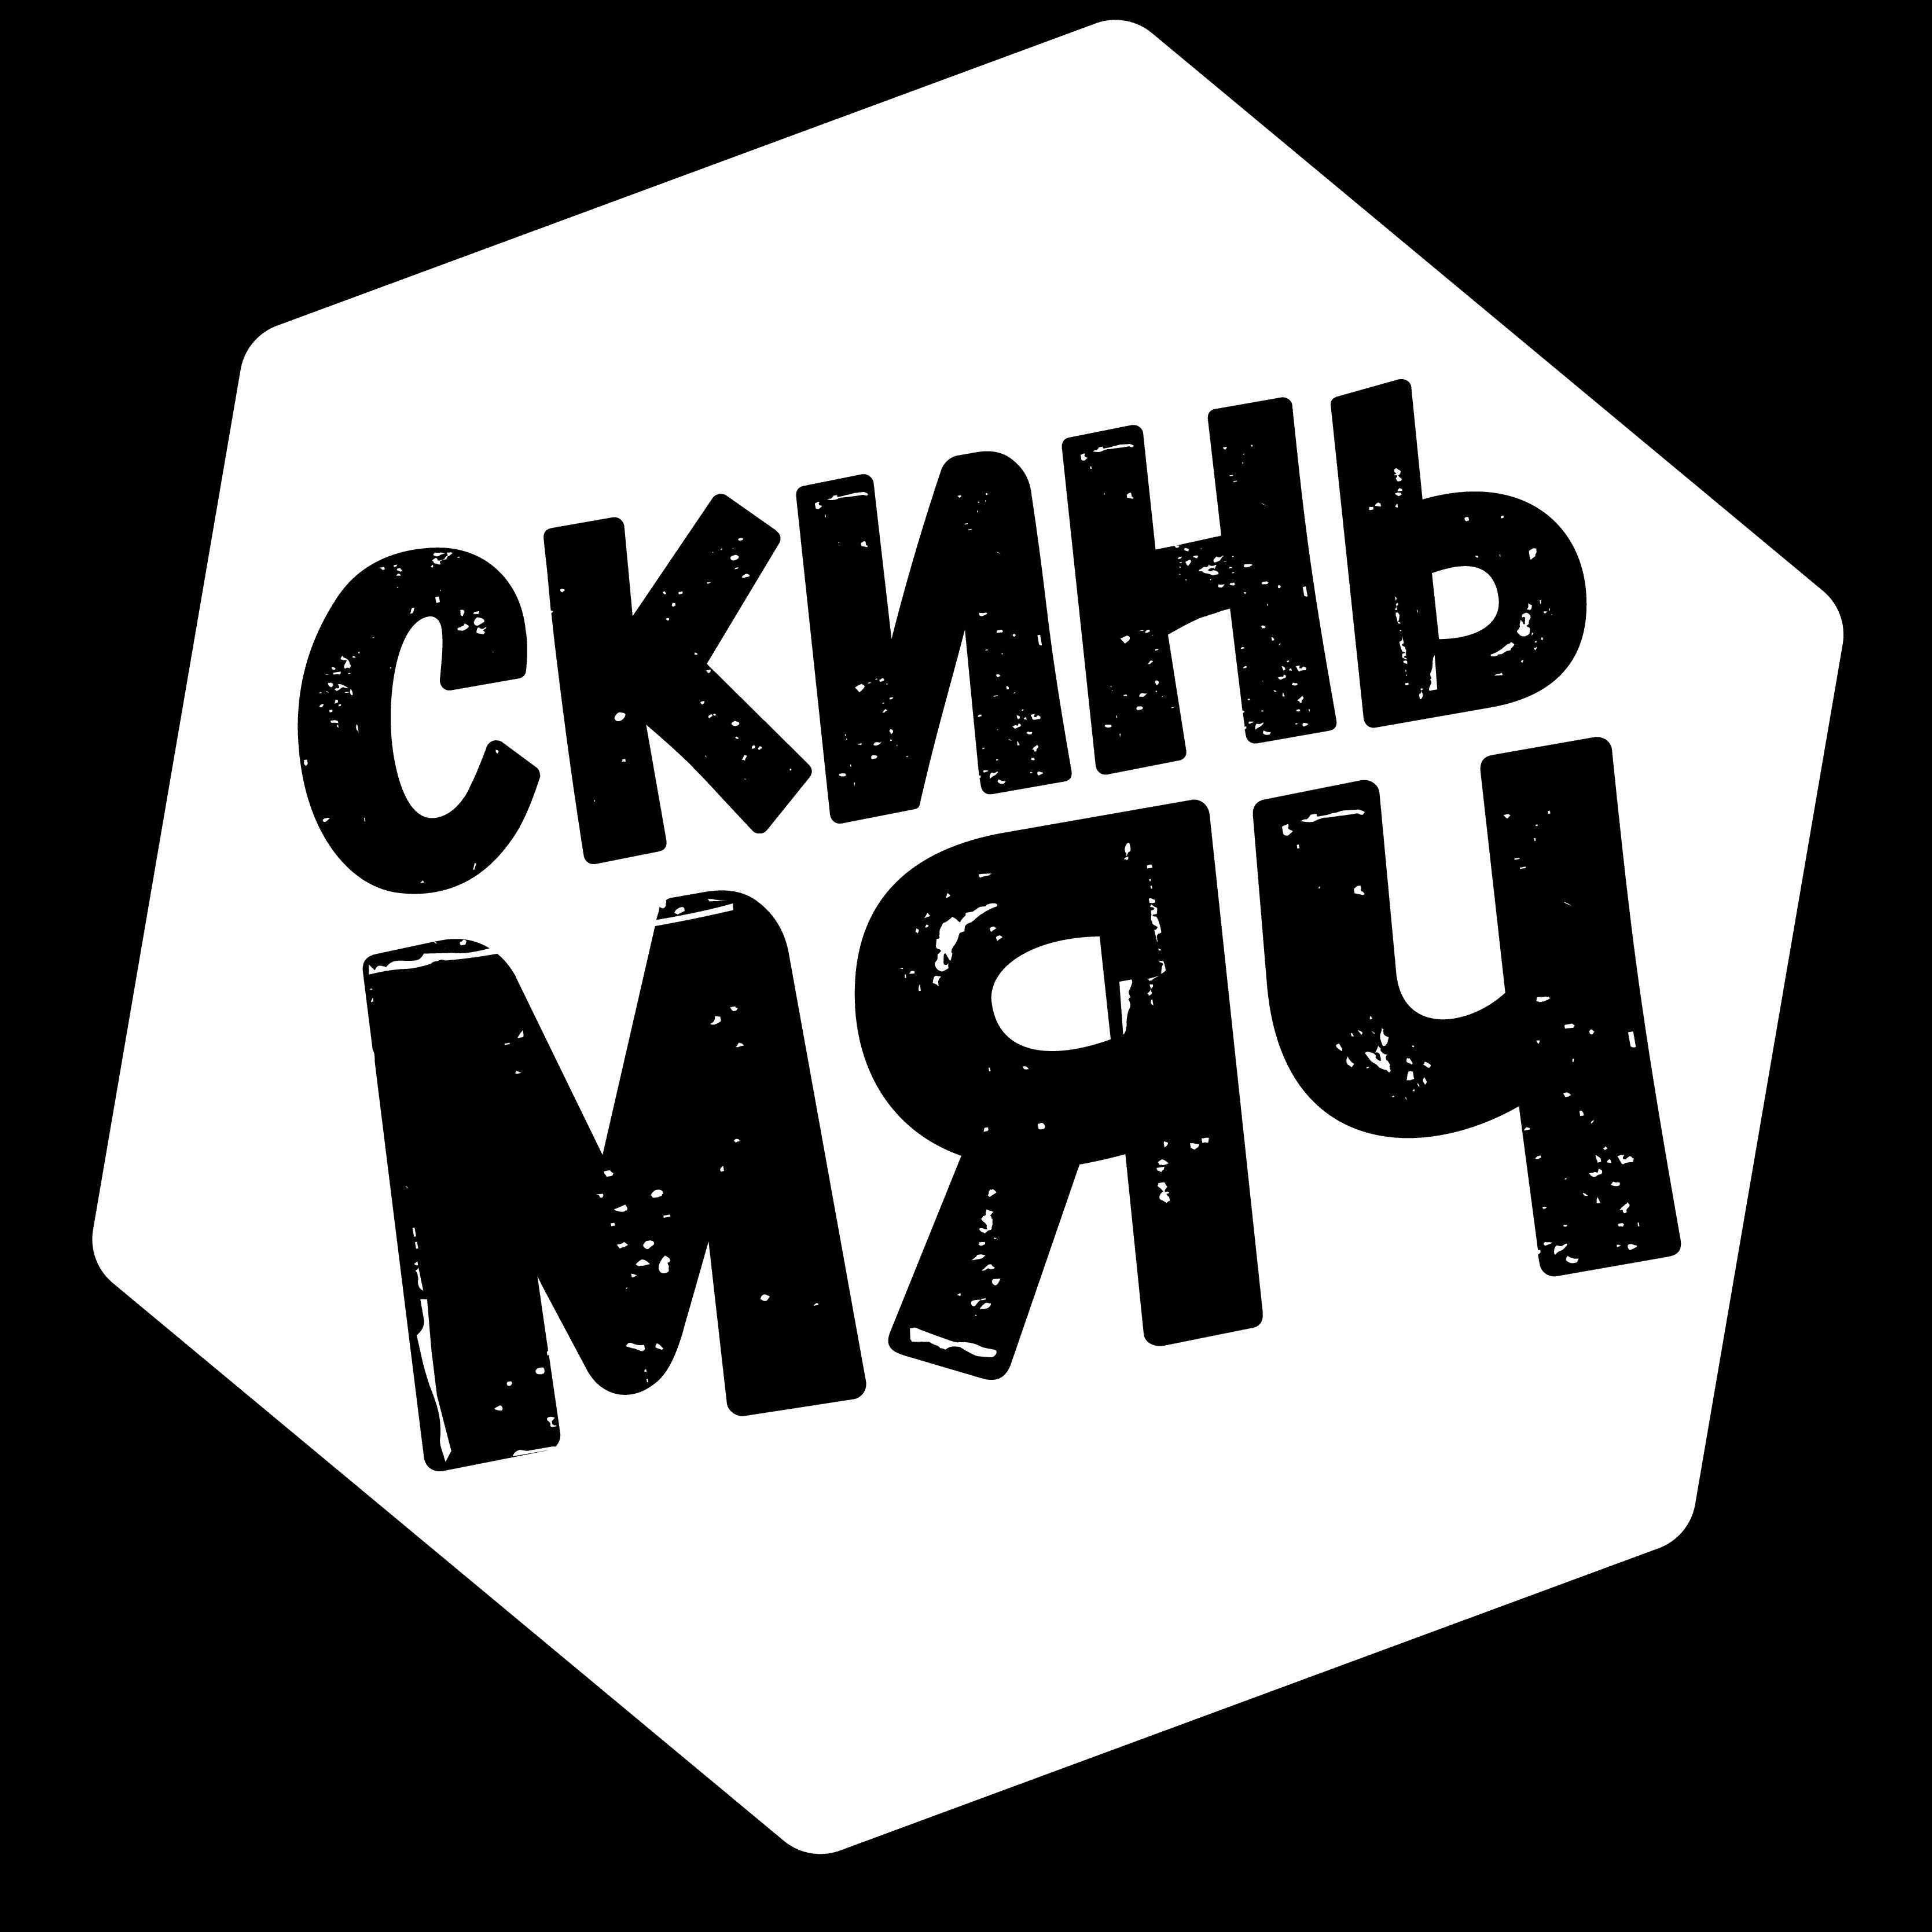 Кокорин и Мамаев – как группа Led Zeppelin. Скинь мяч №3